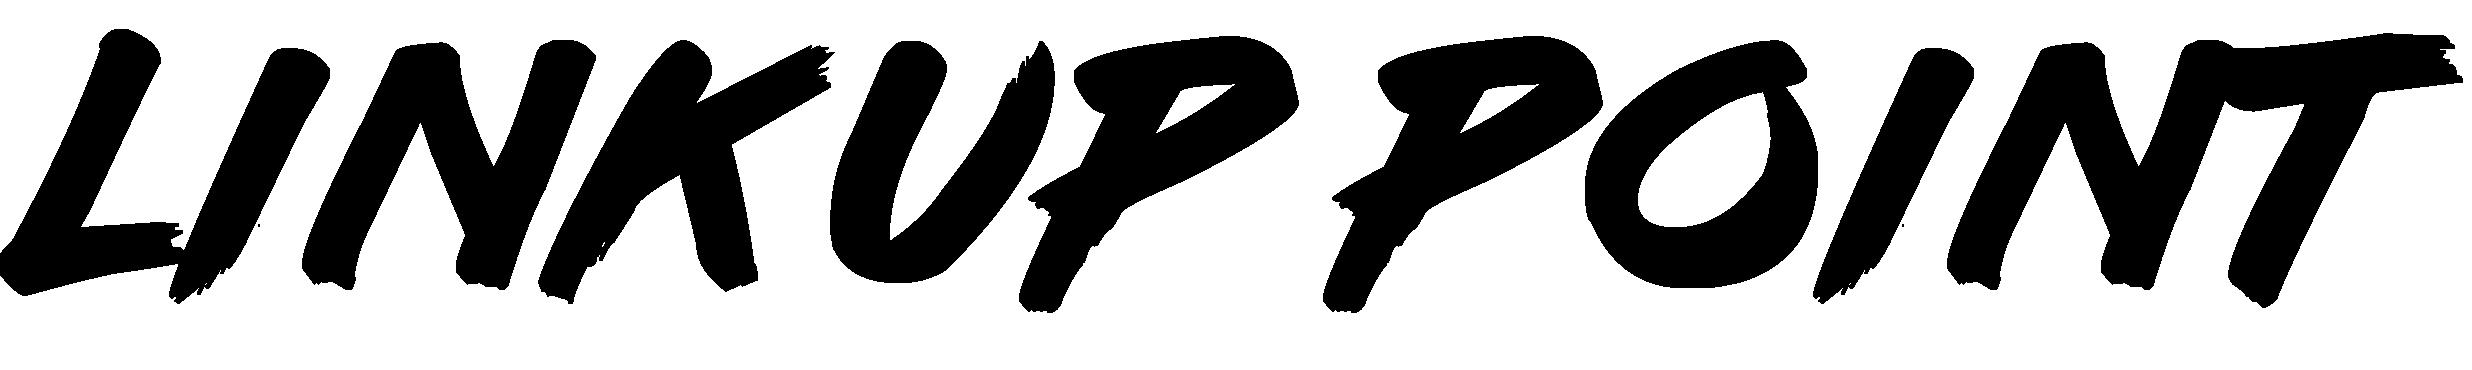 LU Typeface Lazer SEP21